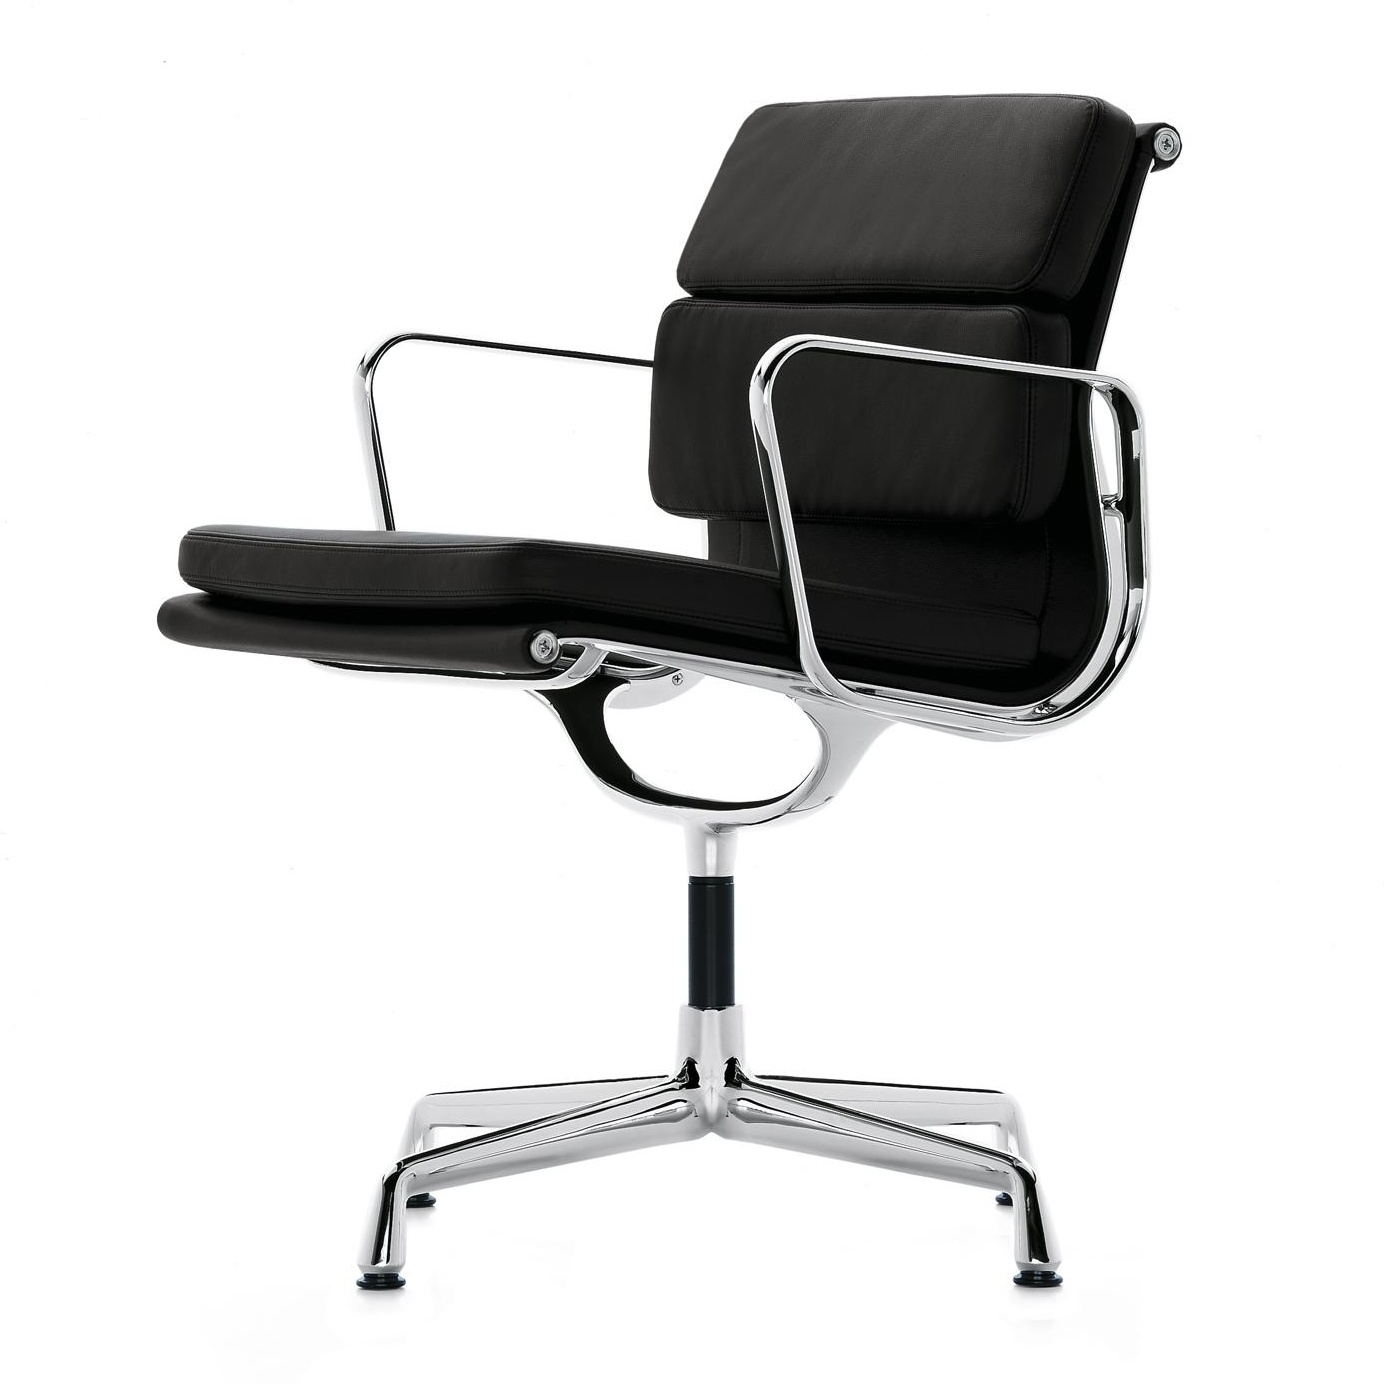 Vitra - EA 207 Soft Pad Konferenzstuhl - schwarz/Bezug Leder 66/Gestell verchromt/nicht drehbar/BxHxT 58x84x59cm | Büro > Bürostühle und Sessel  > Konferenzstühle | Schwarz | Leder| aluminium| polyurethan | Vitra